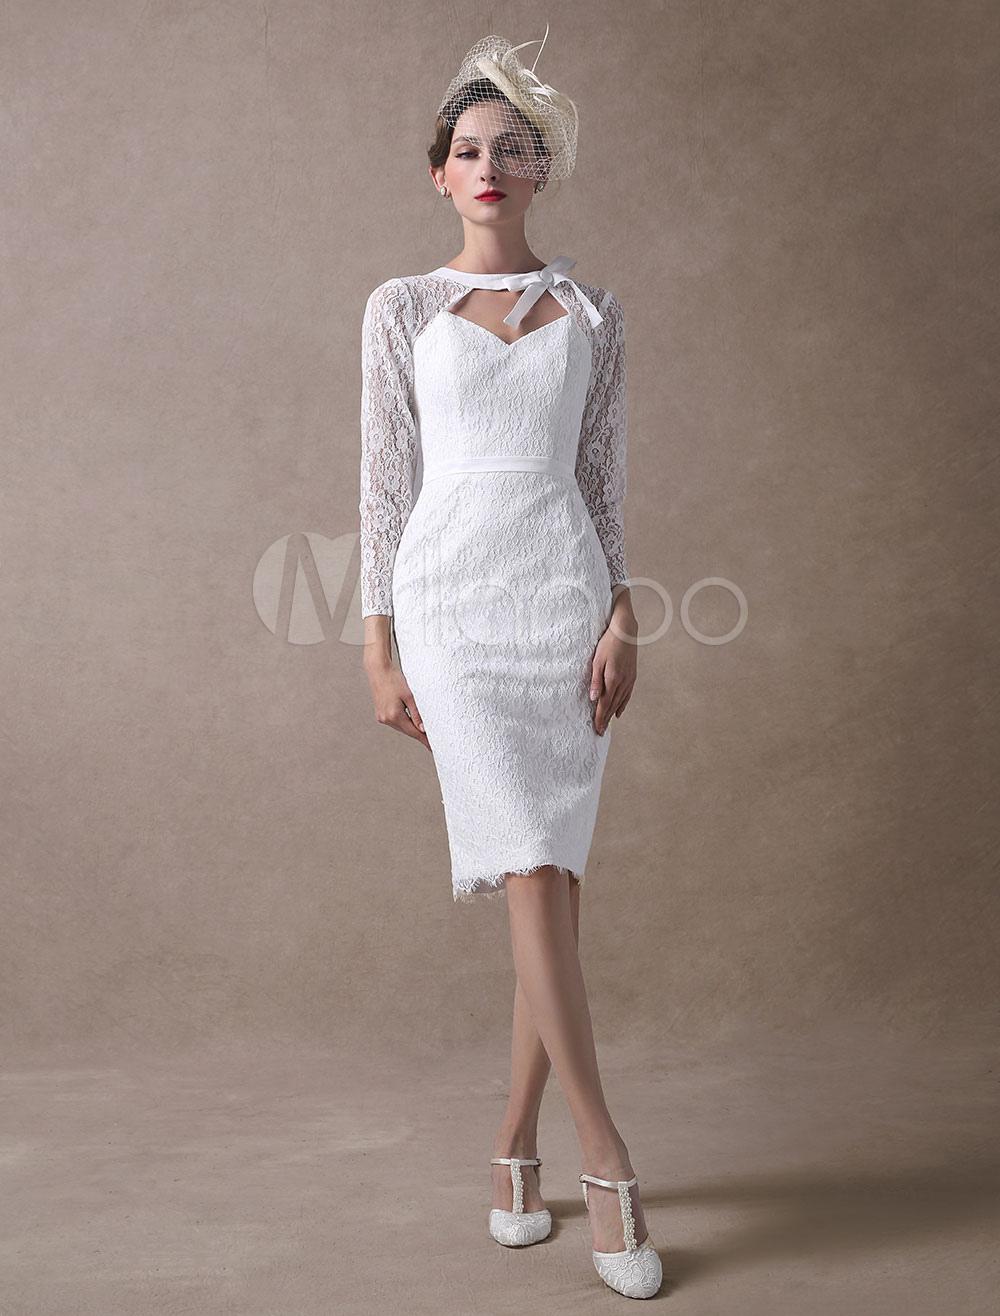 Short Wedding Dresses Lace Sheath Bridal Dress Long Sleeve Cut Out Ivory Knee Length Wedding Gowns photo